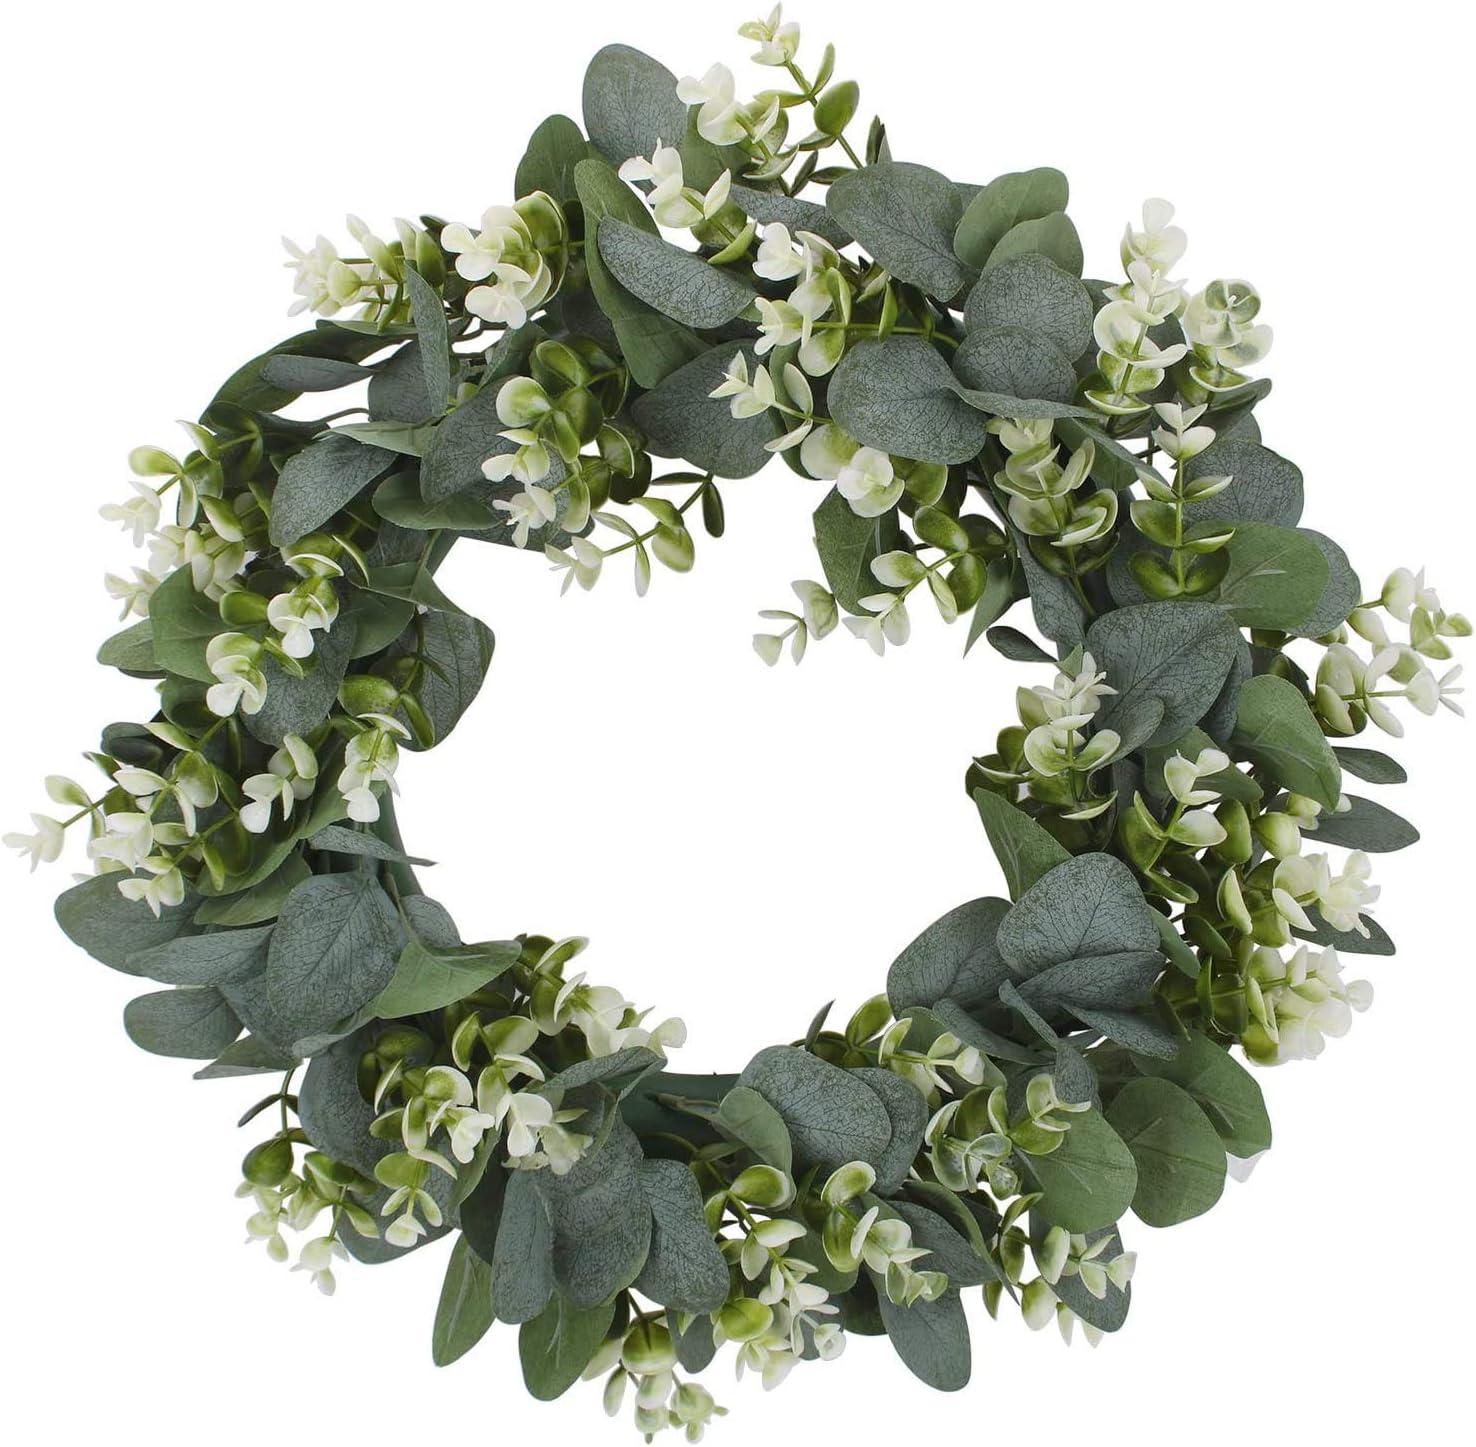 Artificial Popular Green Eucalyptus Chicago Mall Leaf Wreath W Greenery Spring Summer